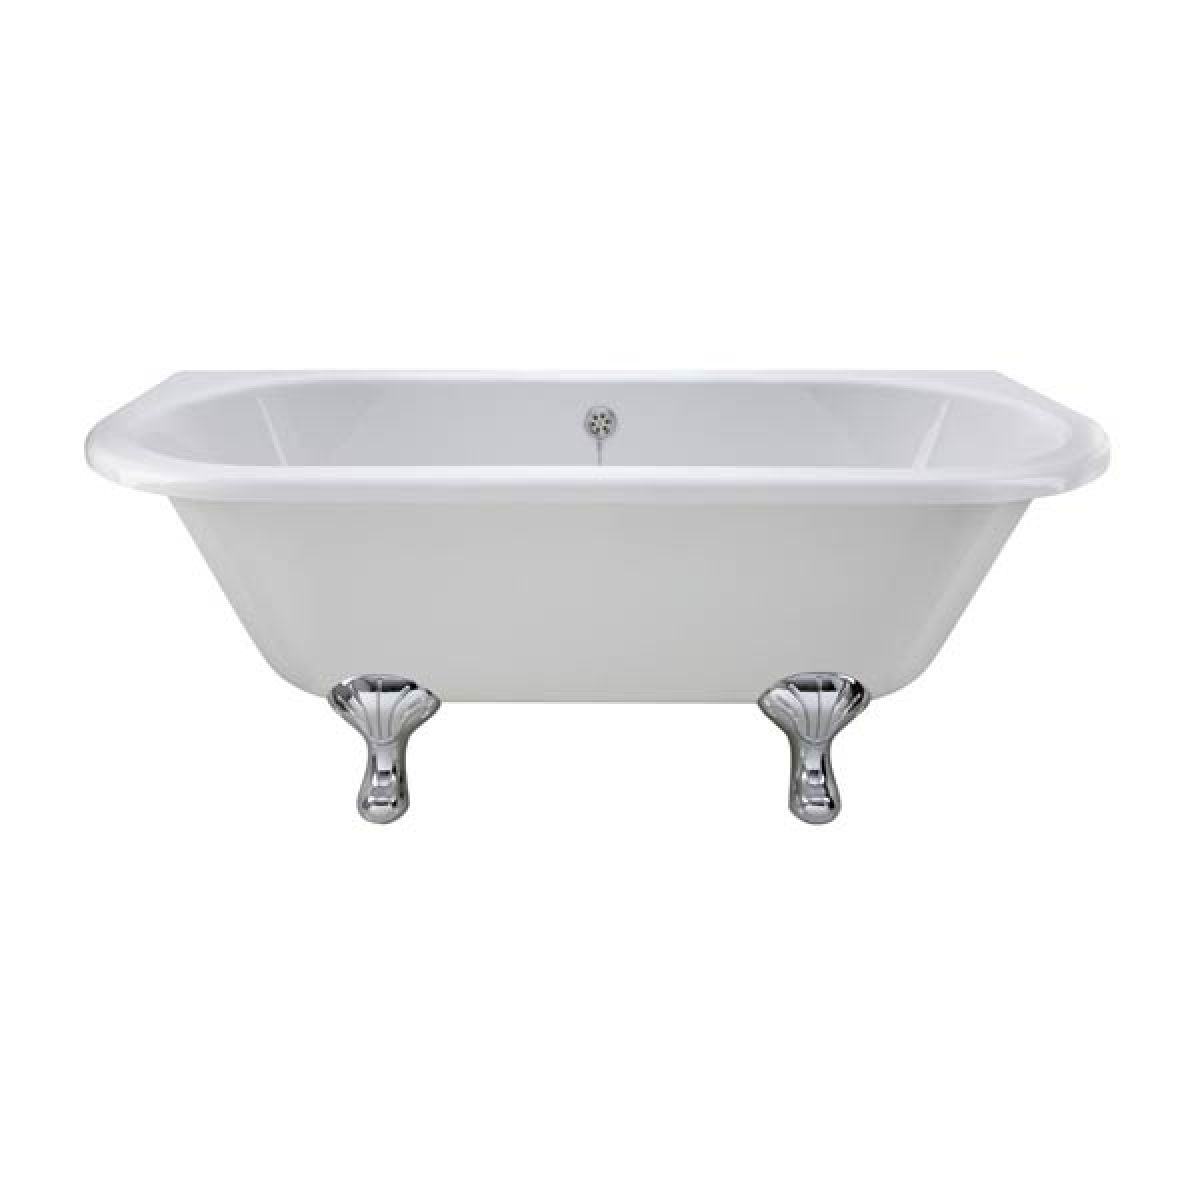 Premier Back to Wall Freestanding Bath with Corbel Leg Set 1700mm